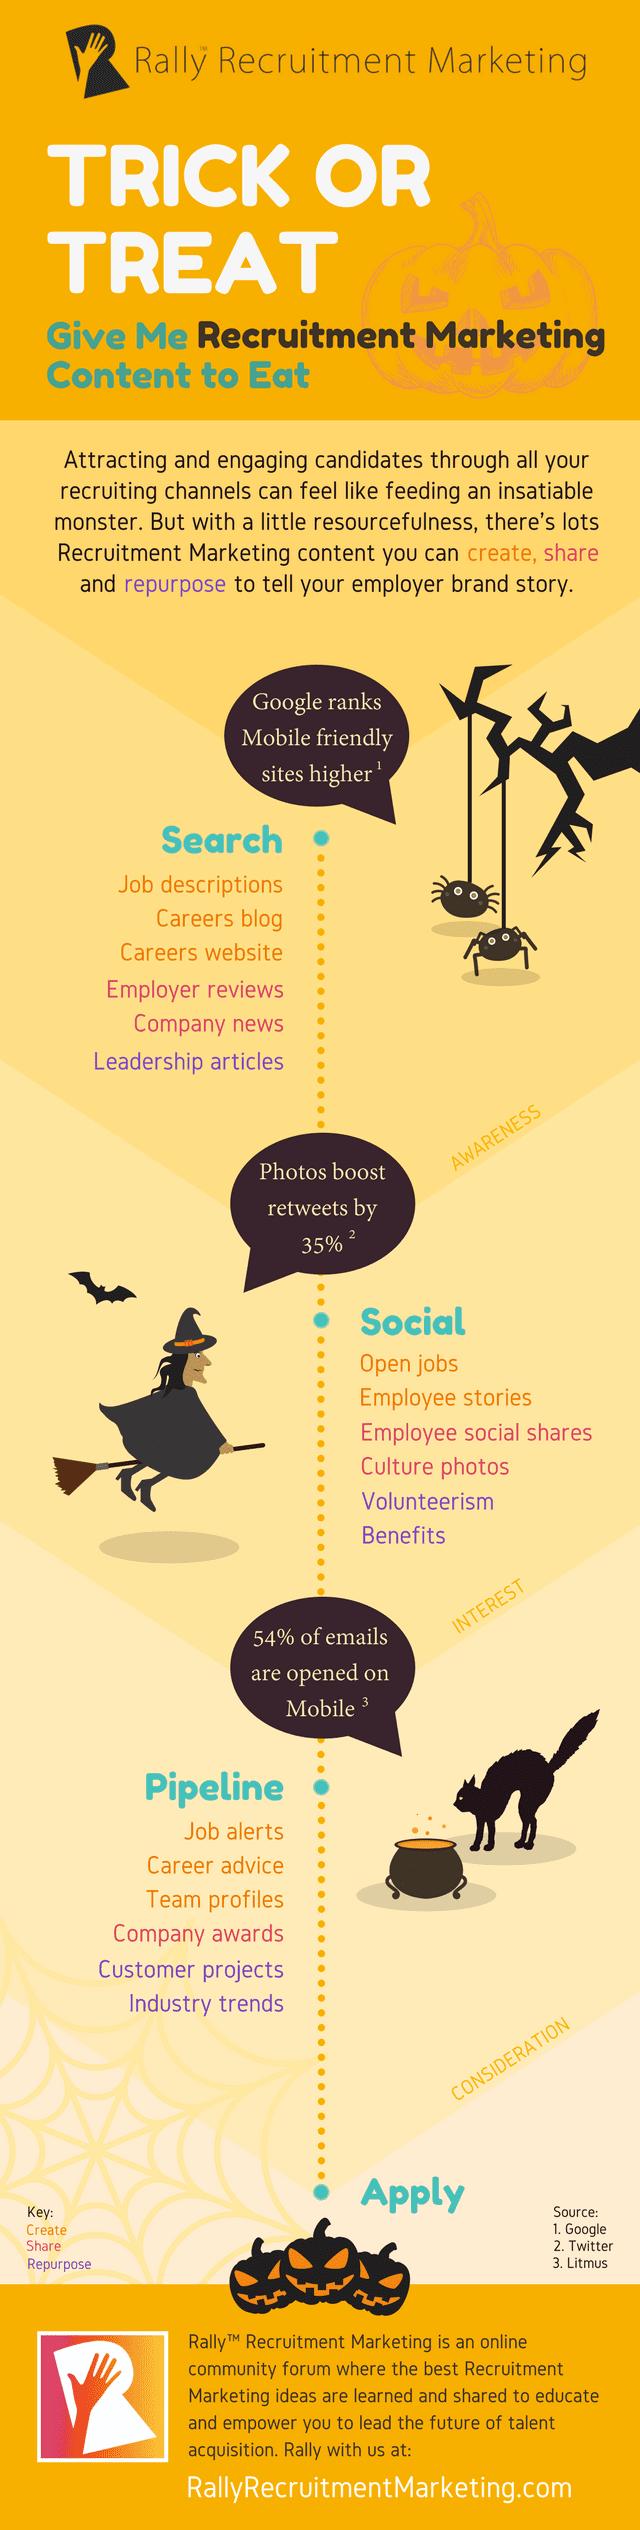 Rally Recruitment Marketing Halloween Infographic